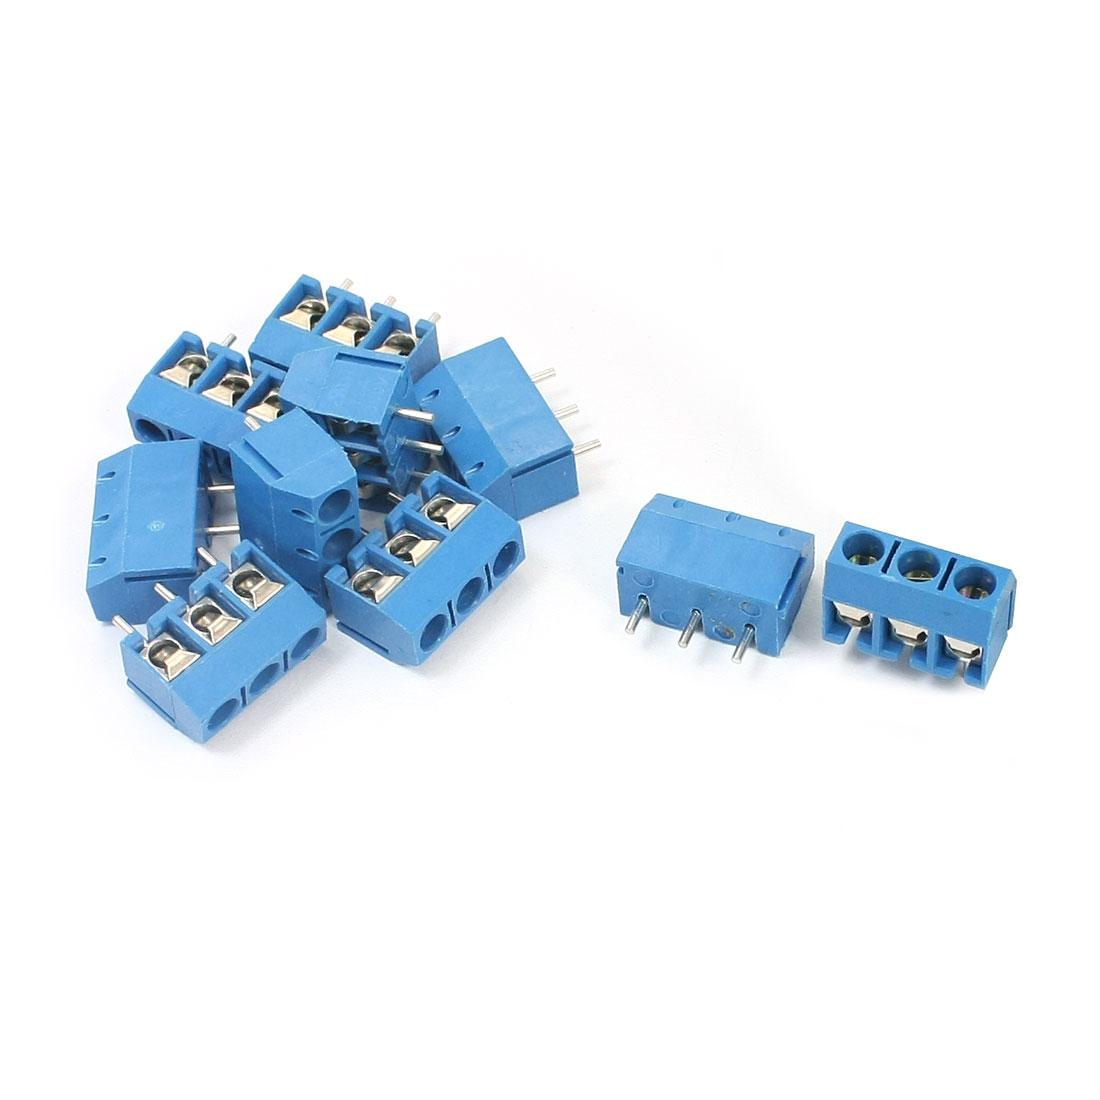 10Pcs 5.08mm 3P Pluggable Type Blue Screw Terminal Block 300V 10A